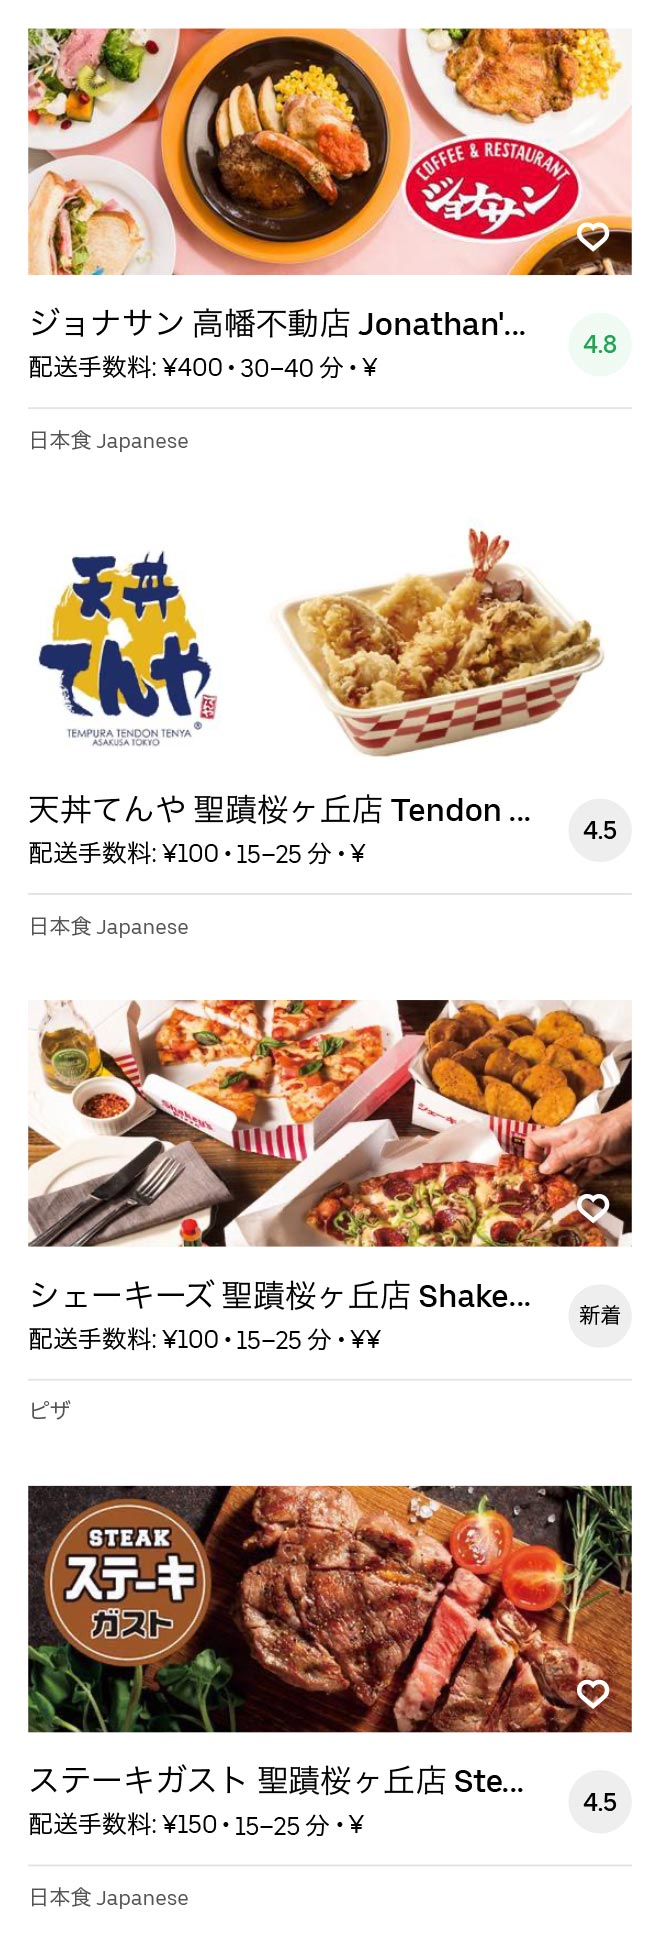 Seiseki menu 2007 08